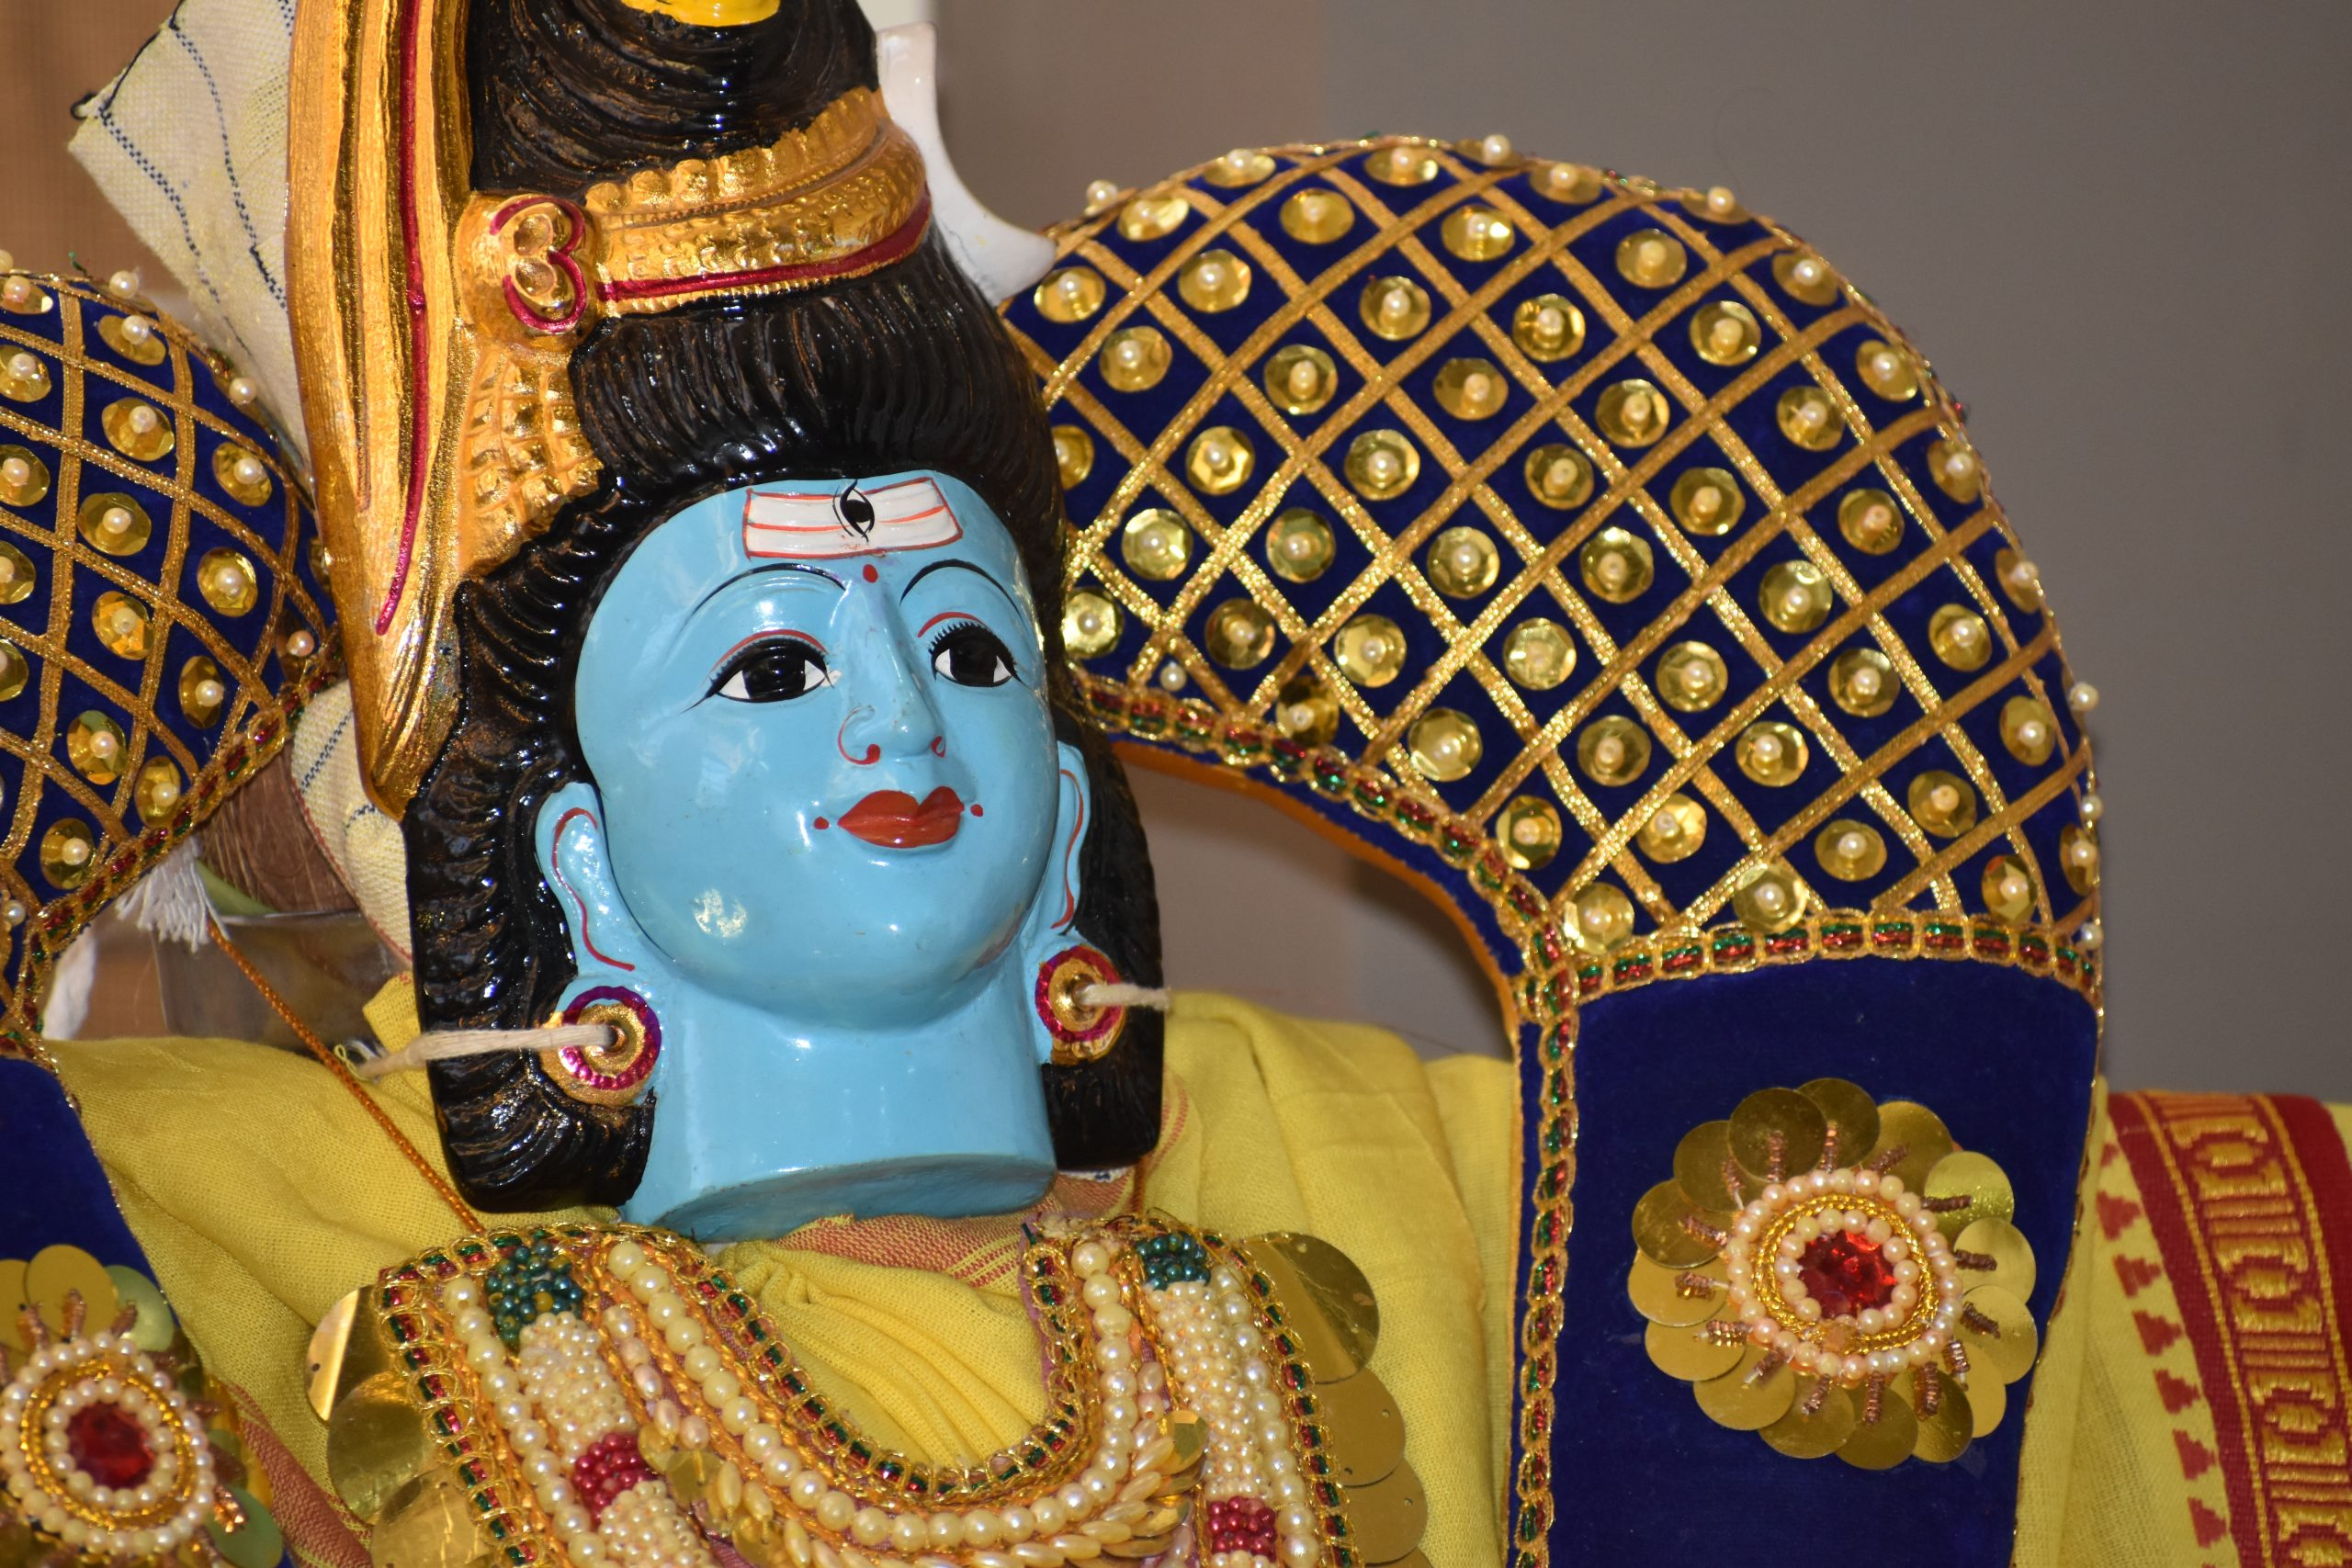 Lord Shiva Sculpture